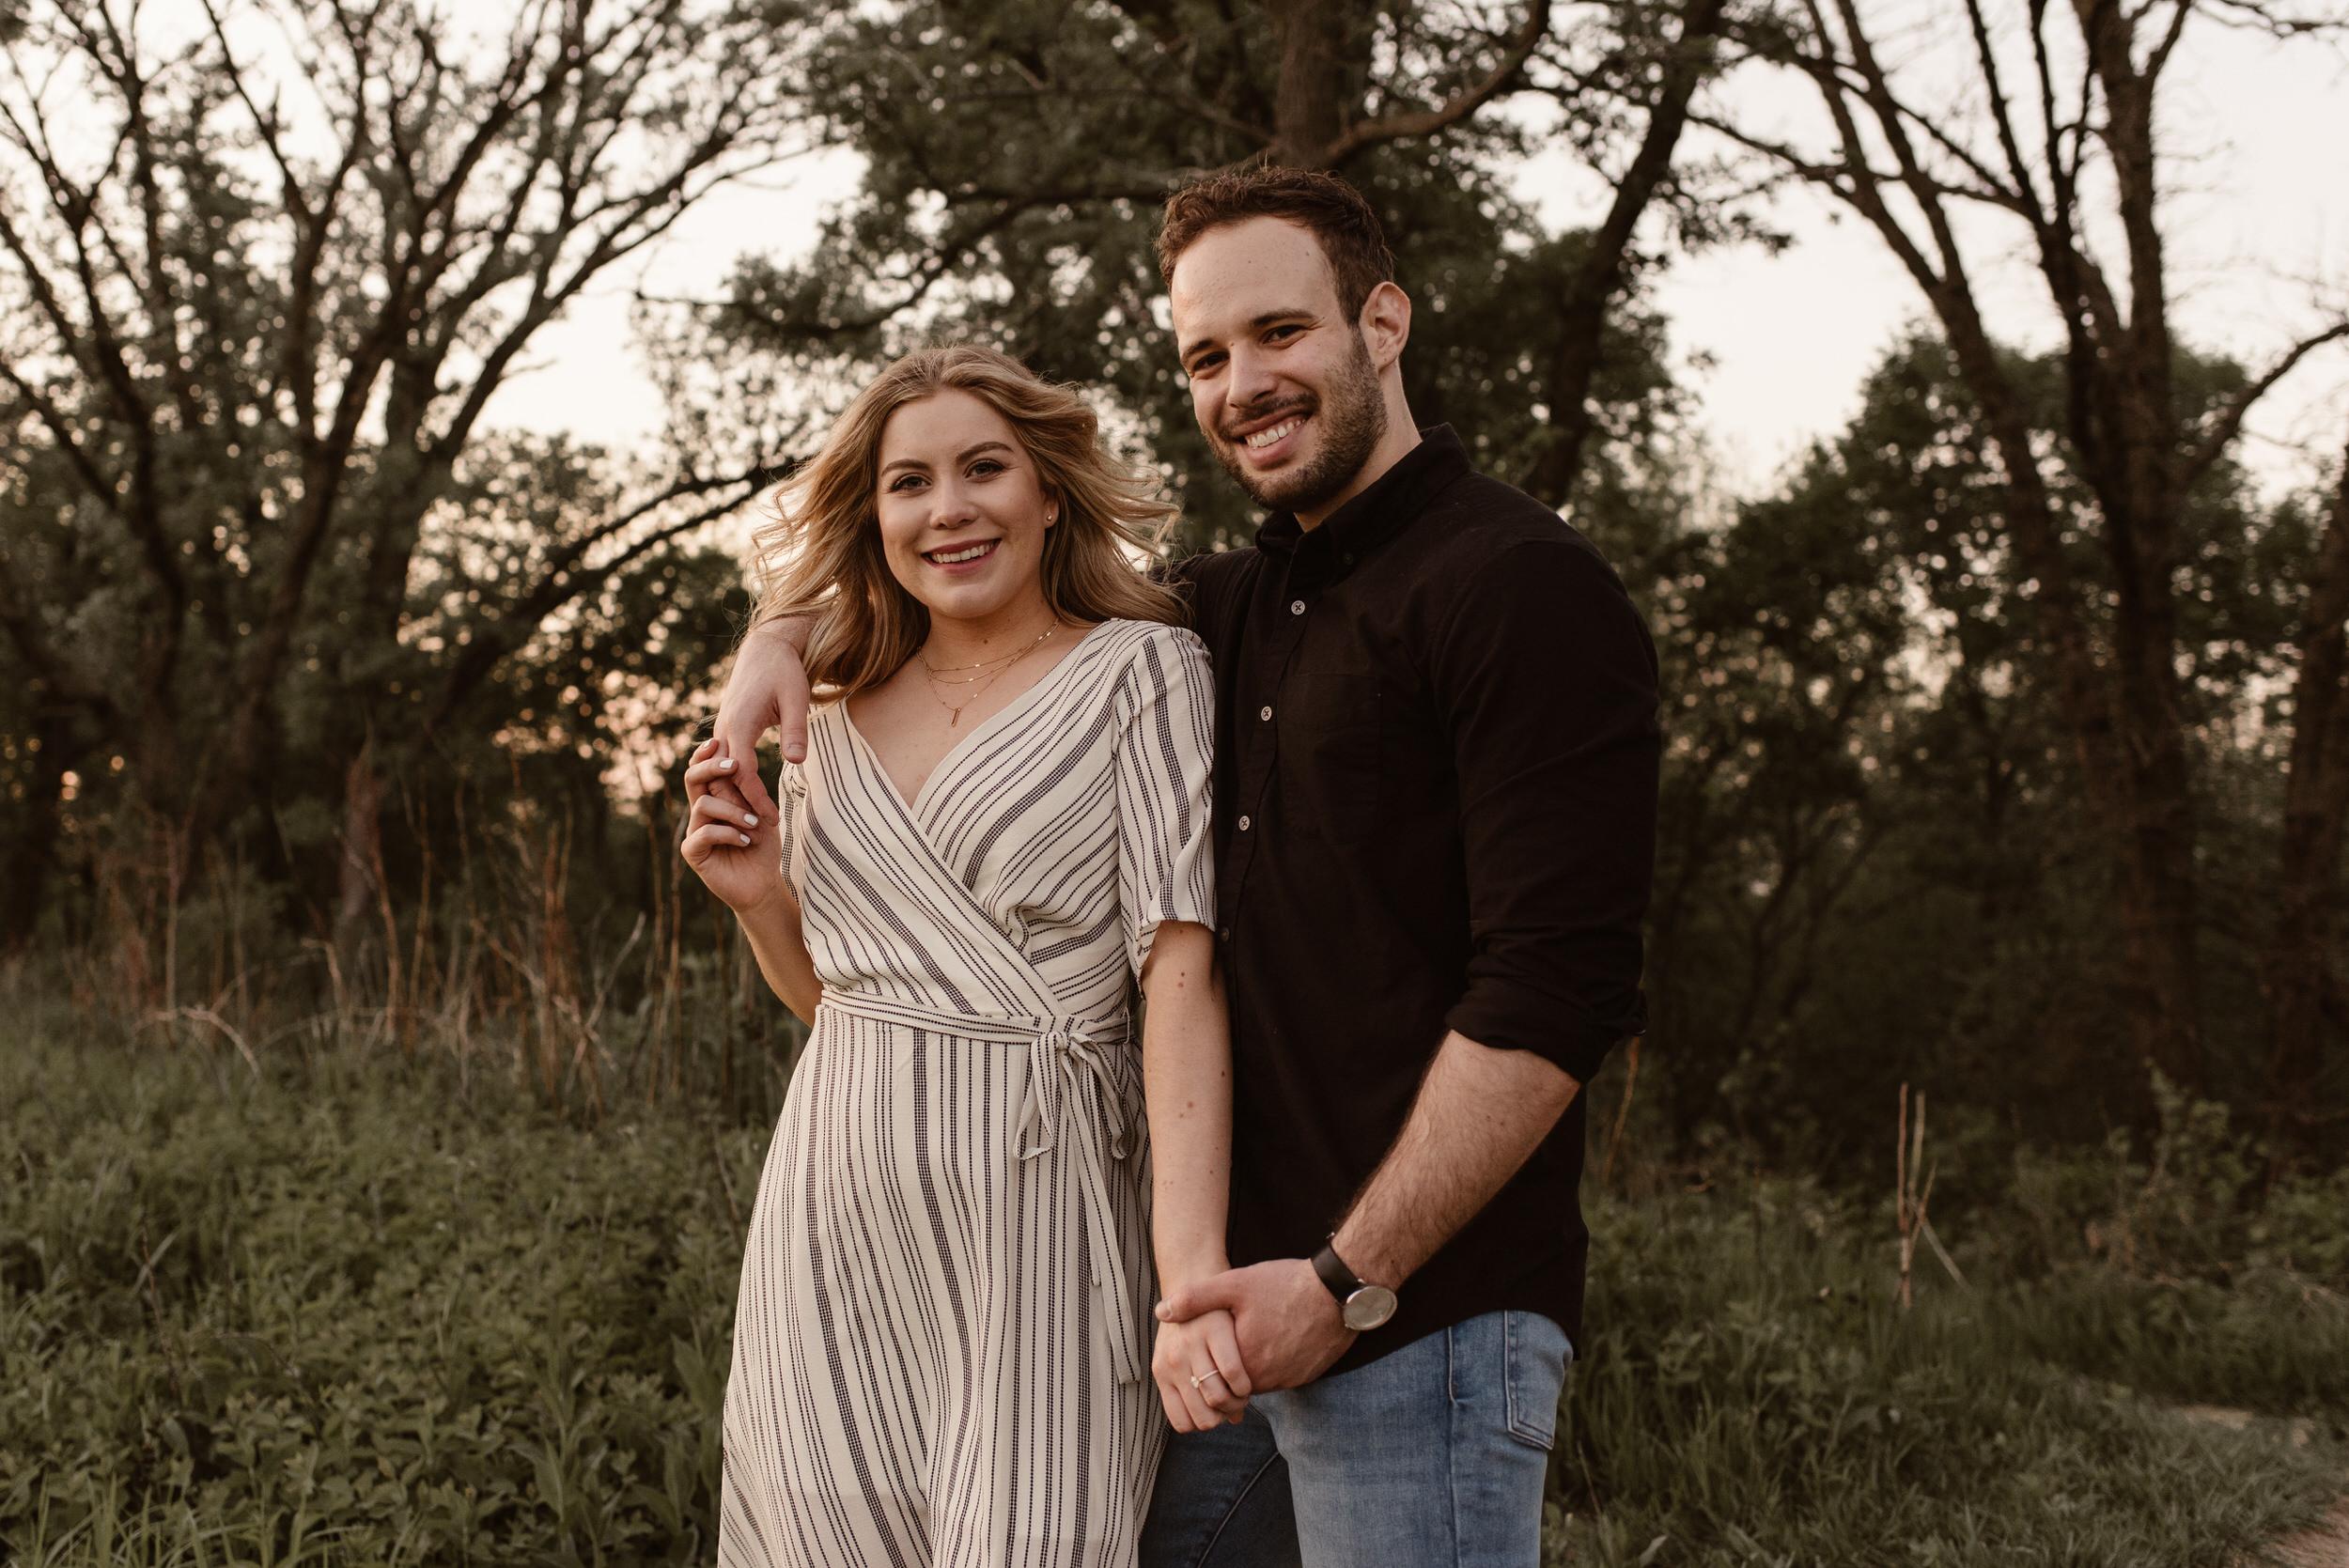 Omaha-Nebraska-Engagement-Session-Kaylie-Sirek-Photography-175.jpg